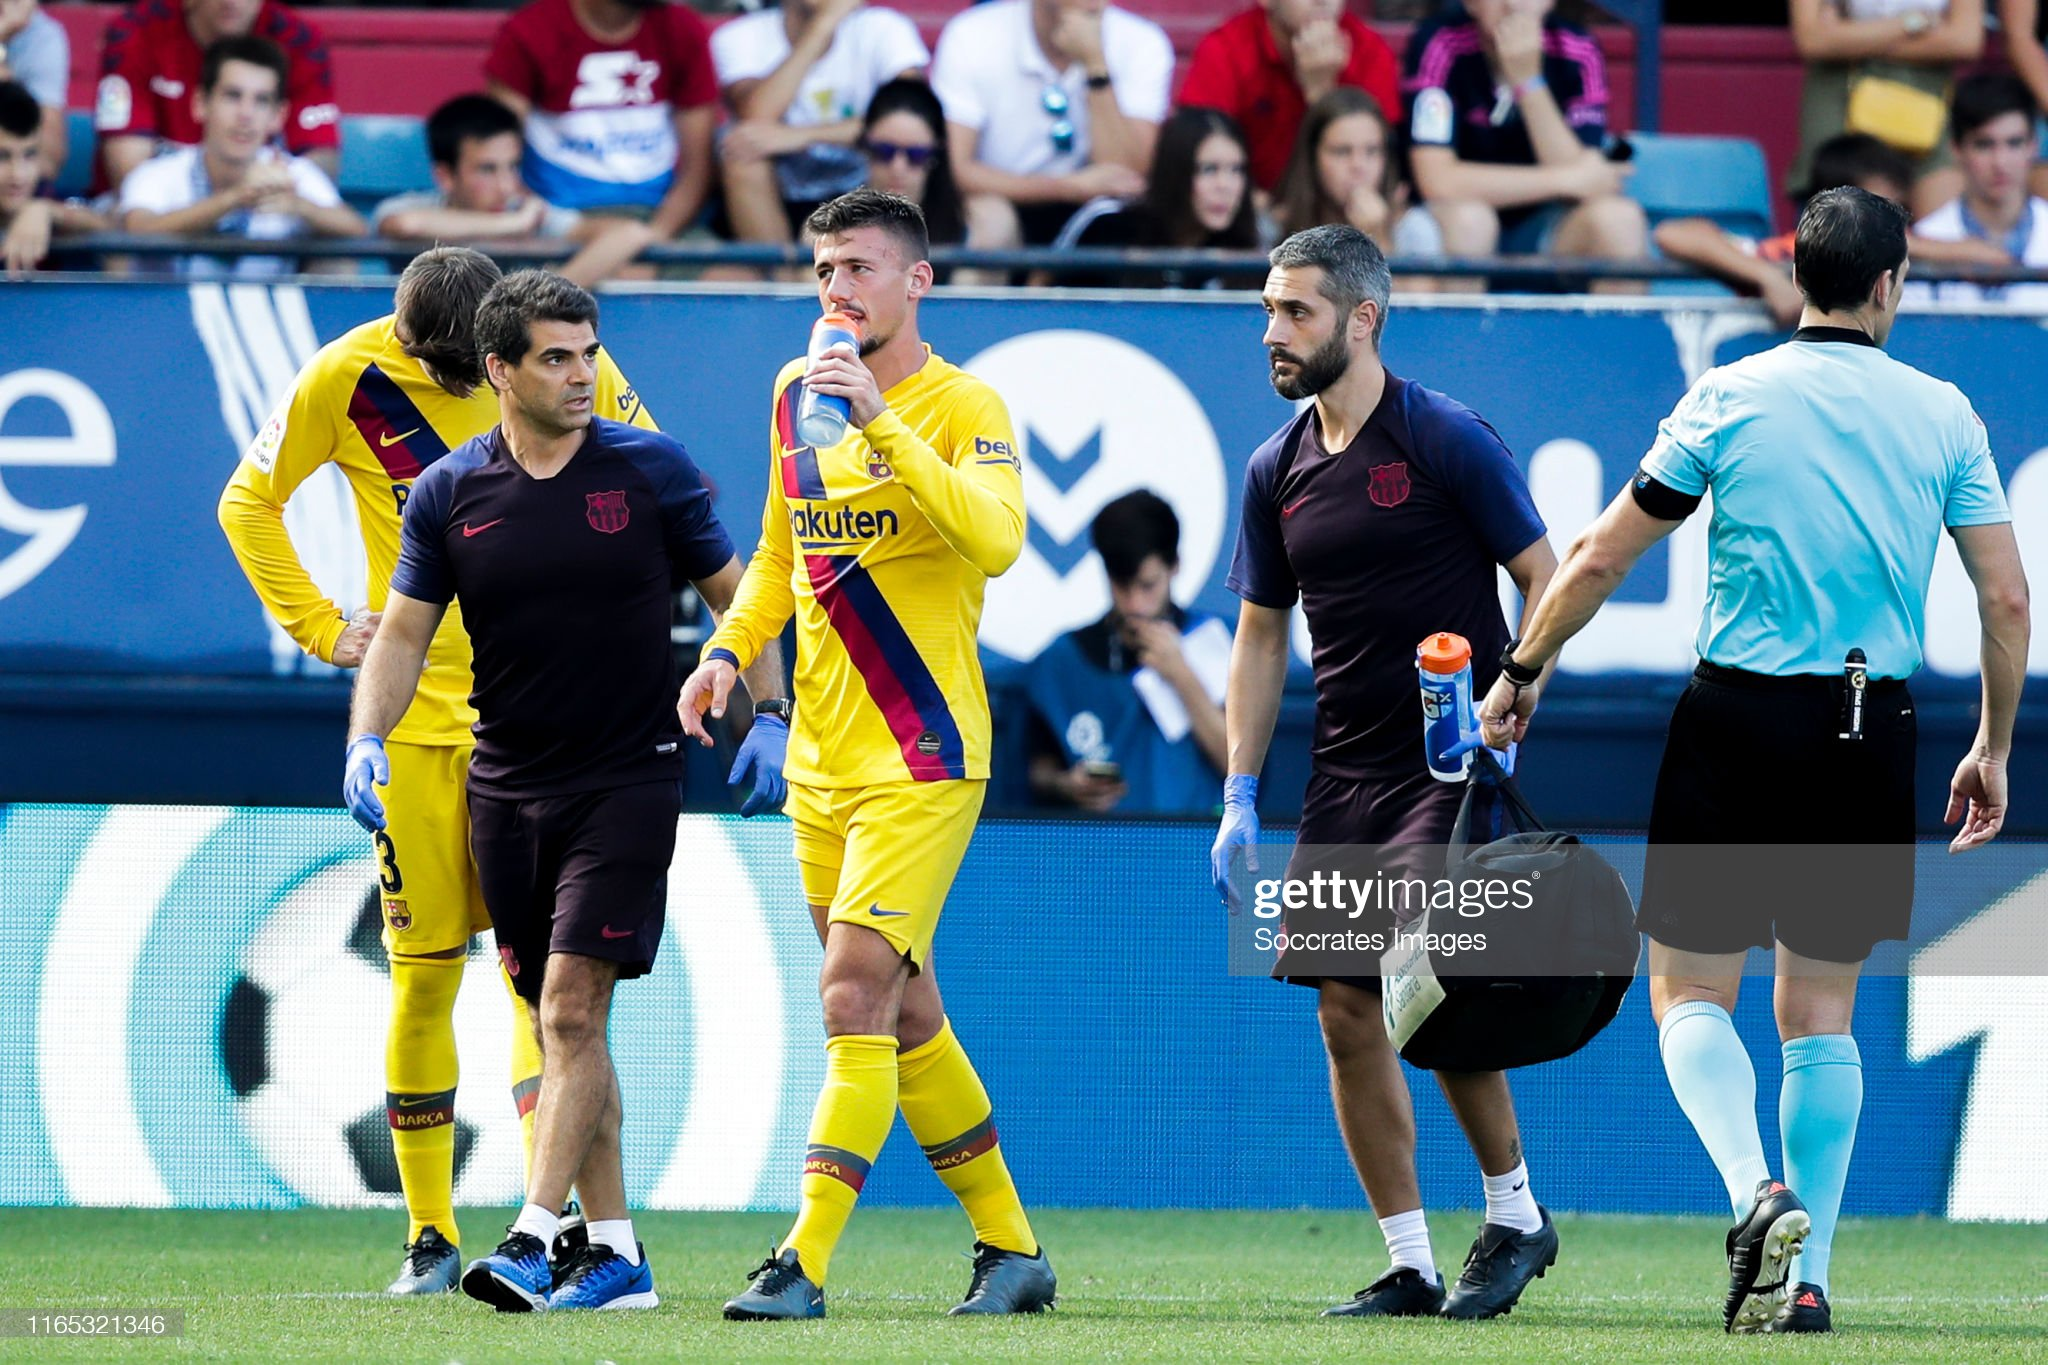 صور مباراة : أوساسونا - برشلونة 2-2 ( 31-08-2019 )  Clement-lenglet-of-fc-barcelona-during-the-la-liga-santander-match-picture-id1165321346?s=2048x2048